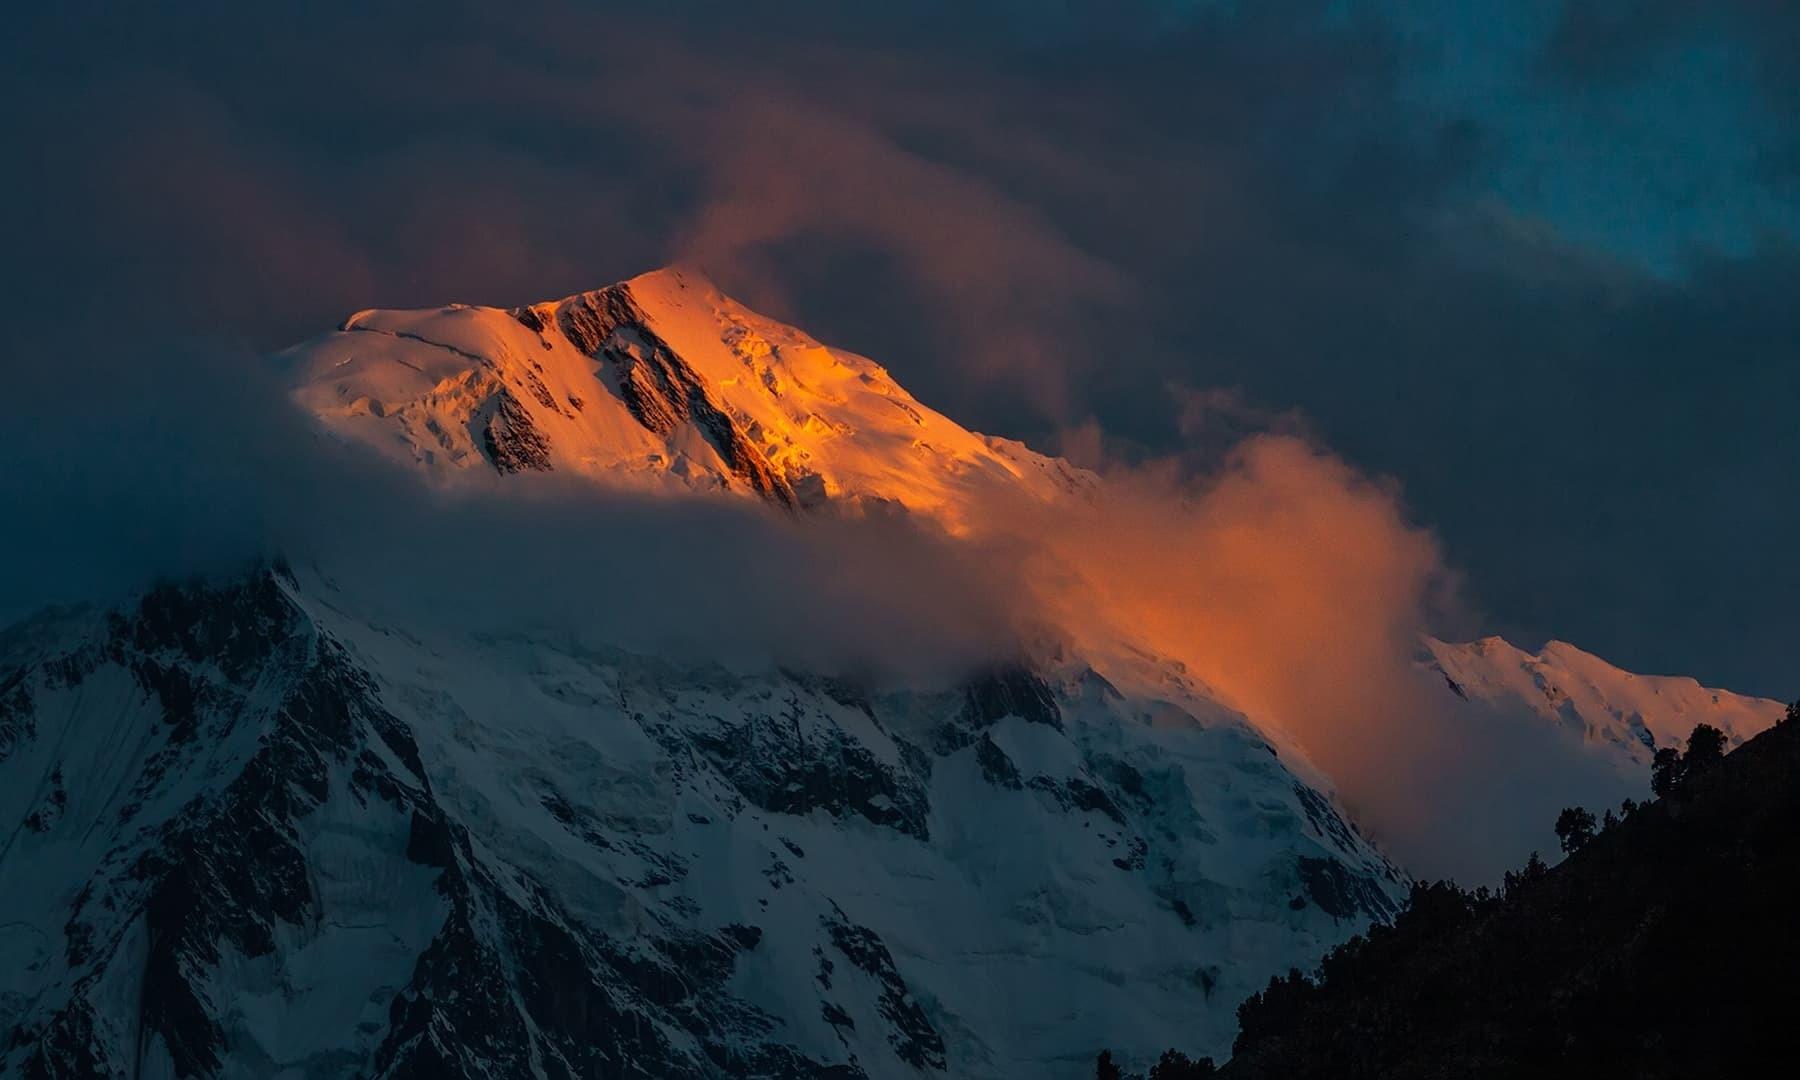 Nanga Parbat shines in the sunlight. — Photo by Syed Mehdi Bukhari